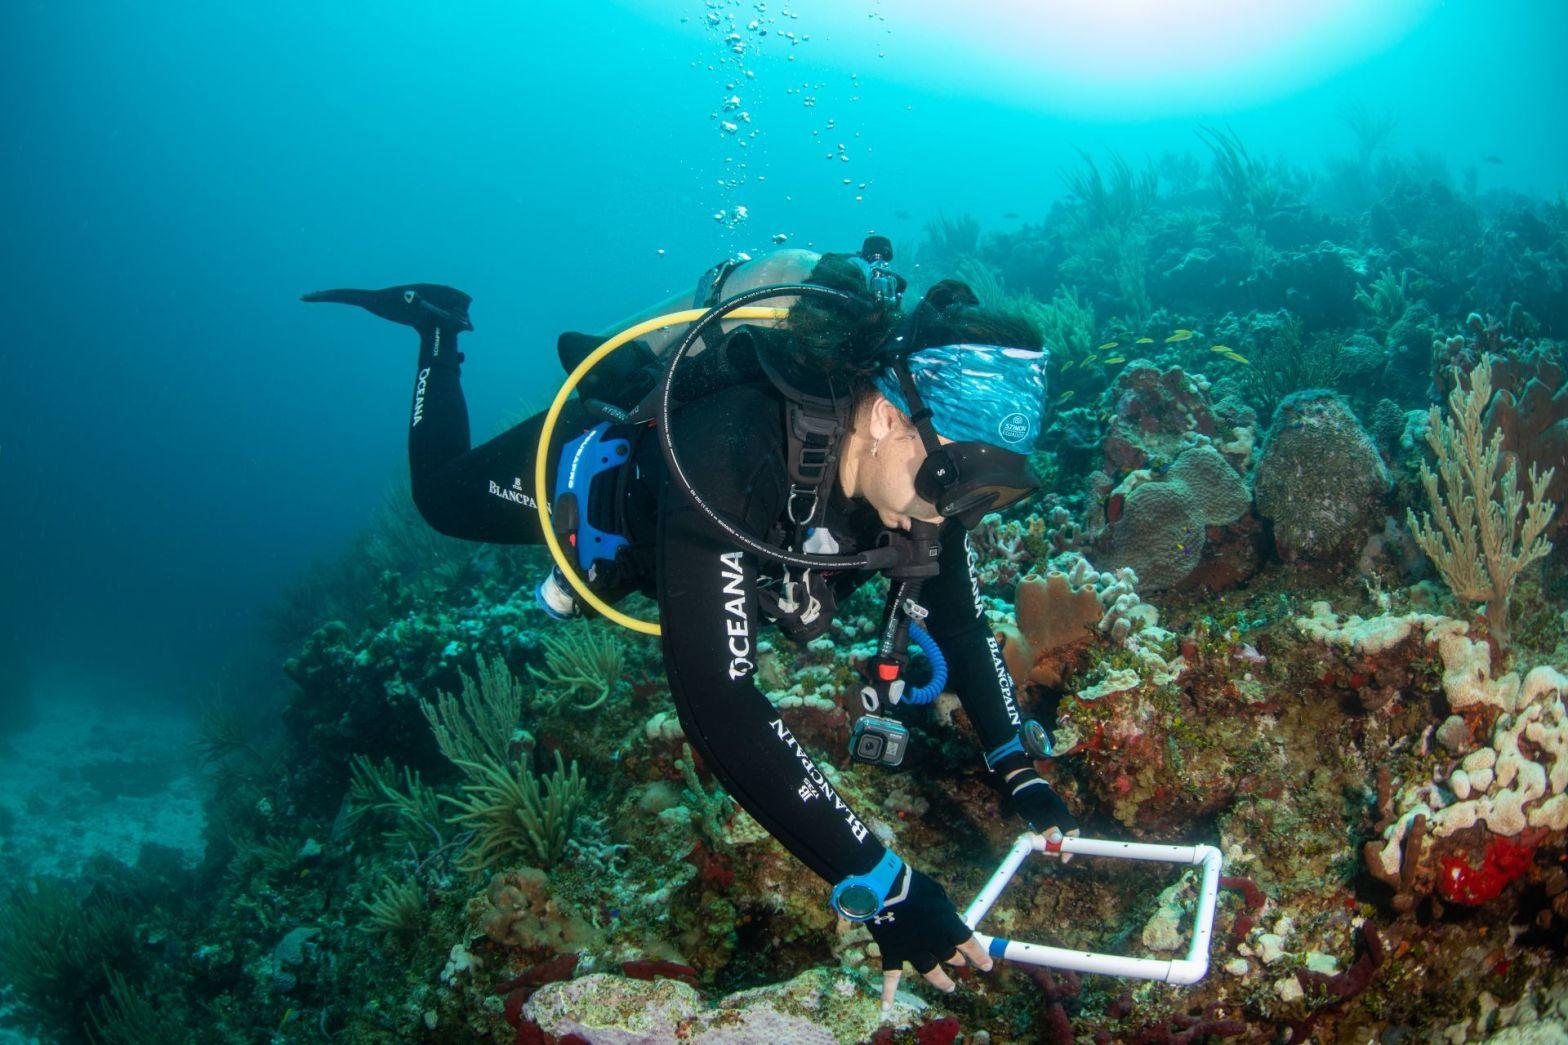 Buzó explorando un arrecife de coral